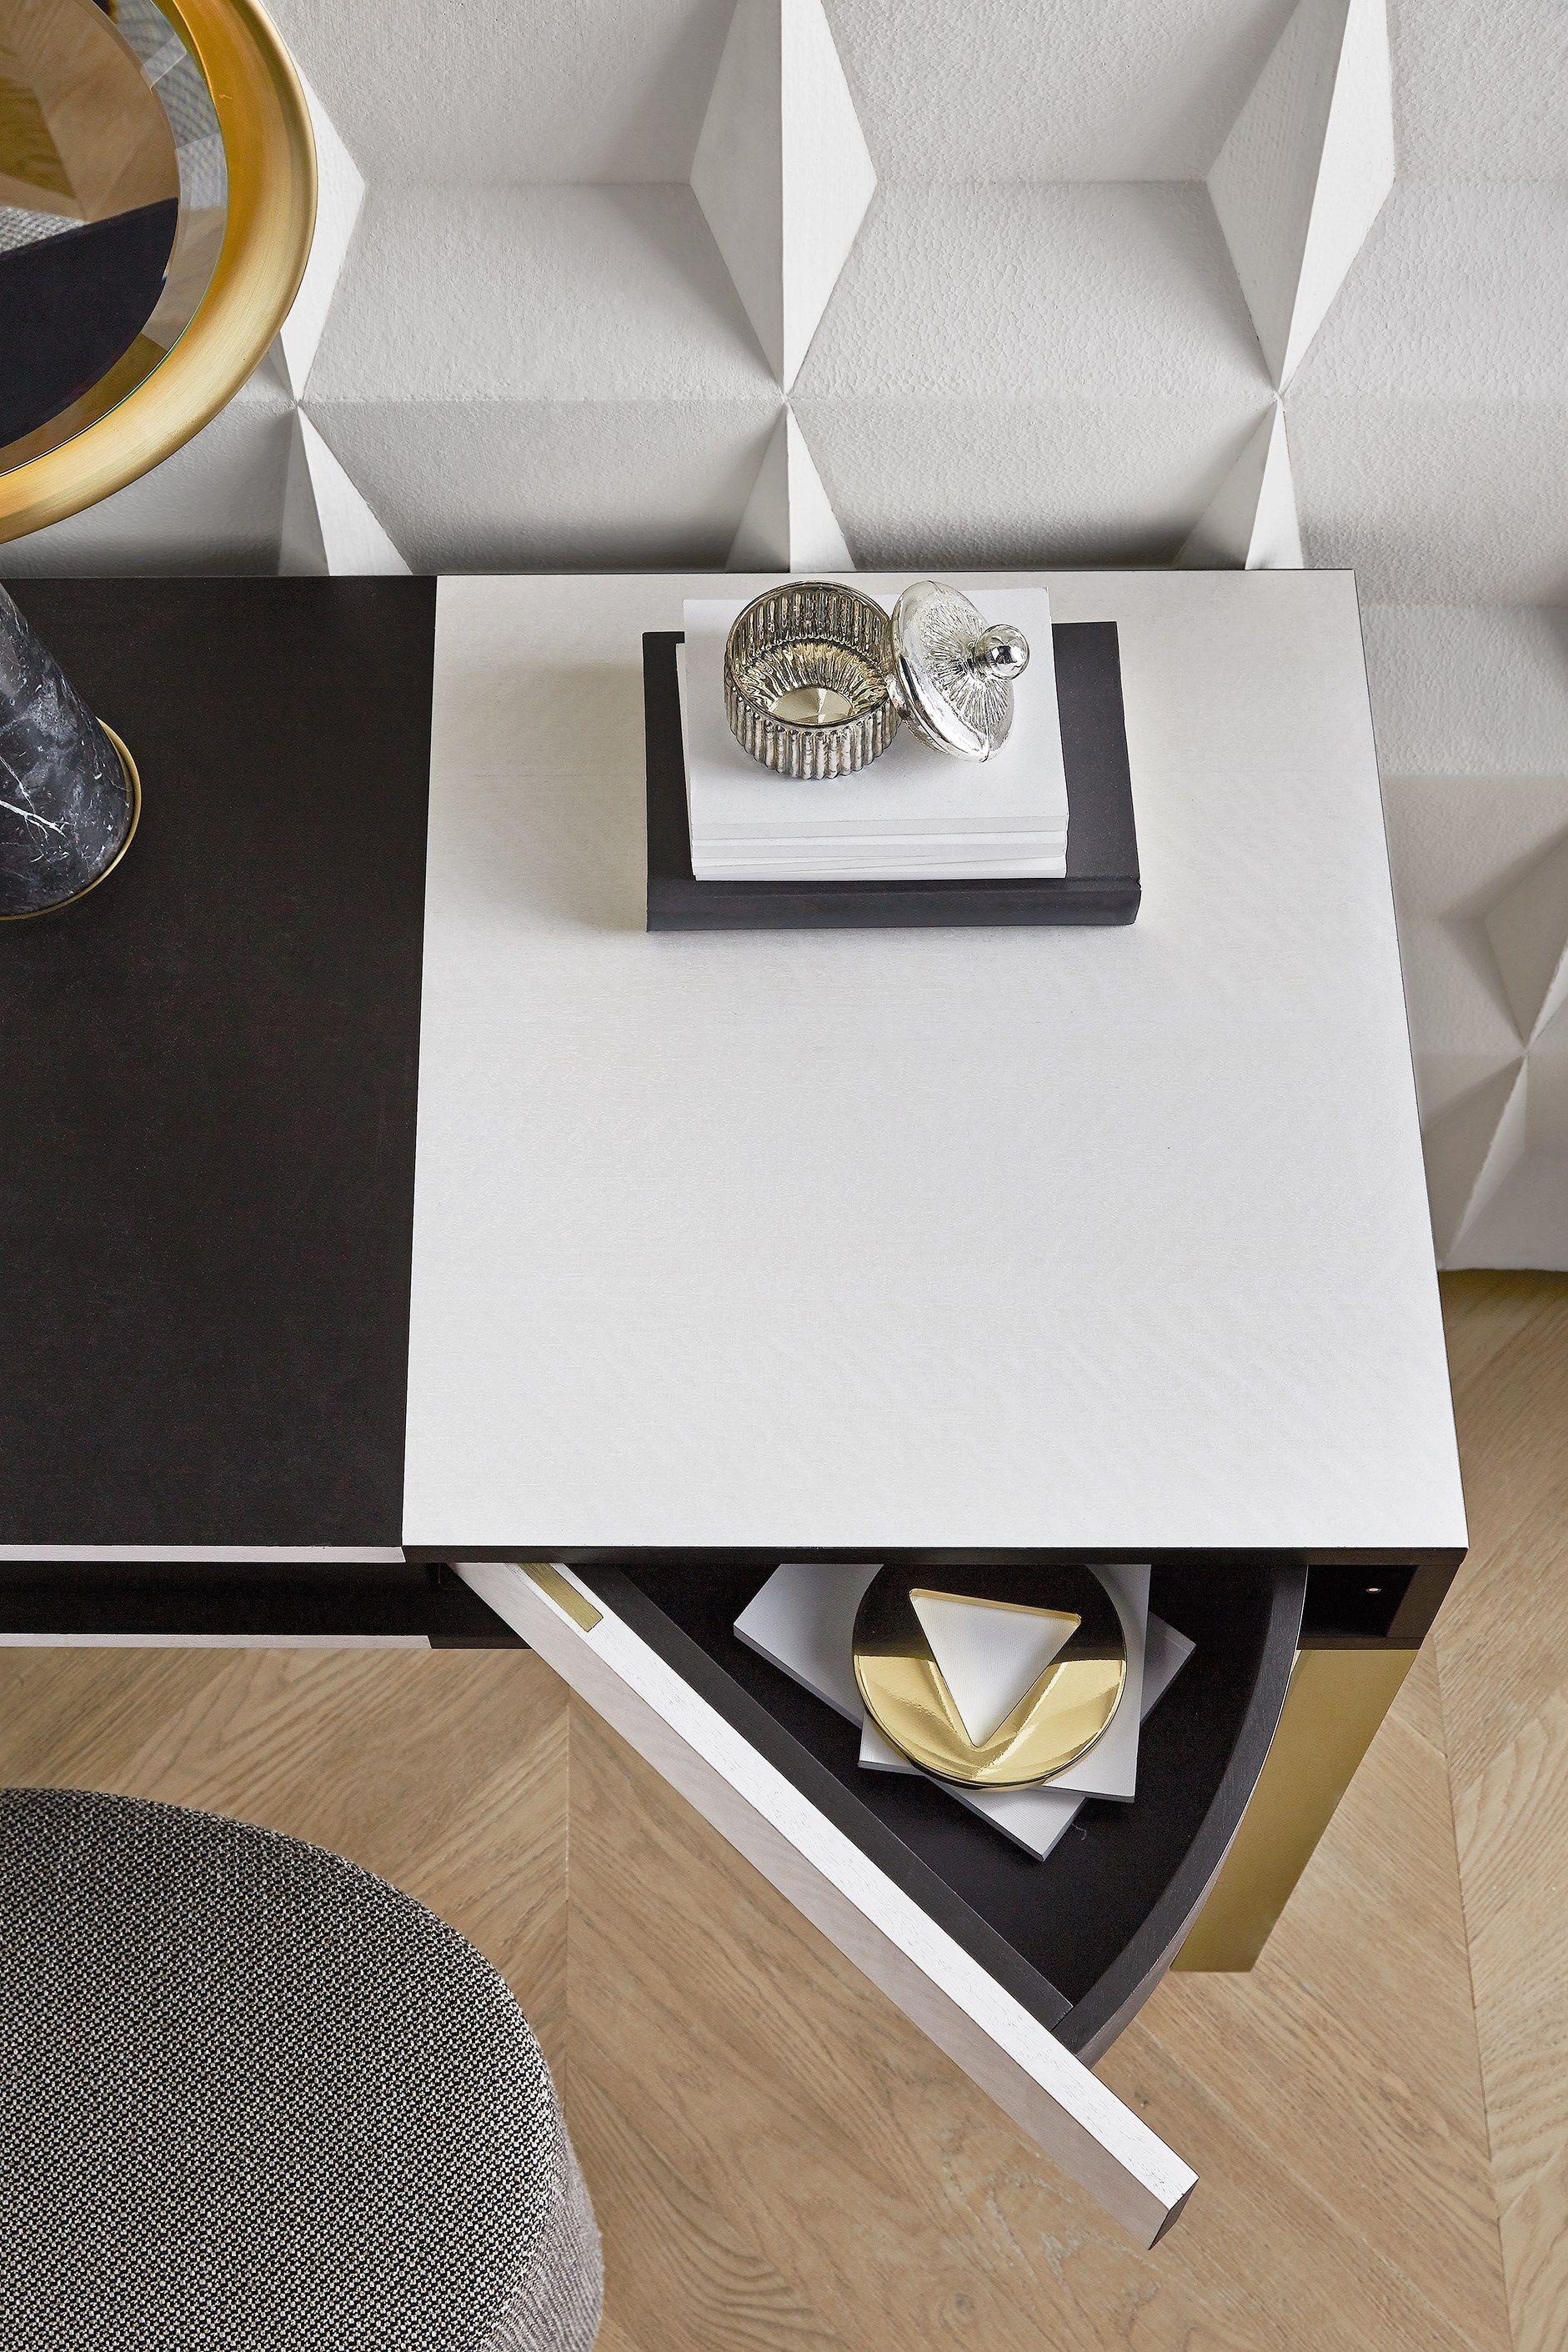 schminktisch aus holz selene by gallotti radice design pietro russo. Black Bedroom Furniture Sets. Home Design Ideas